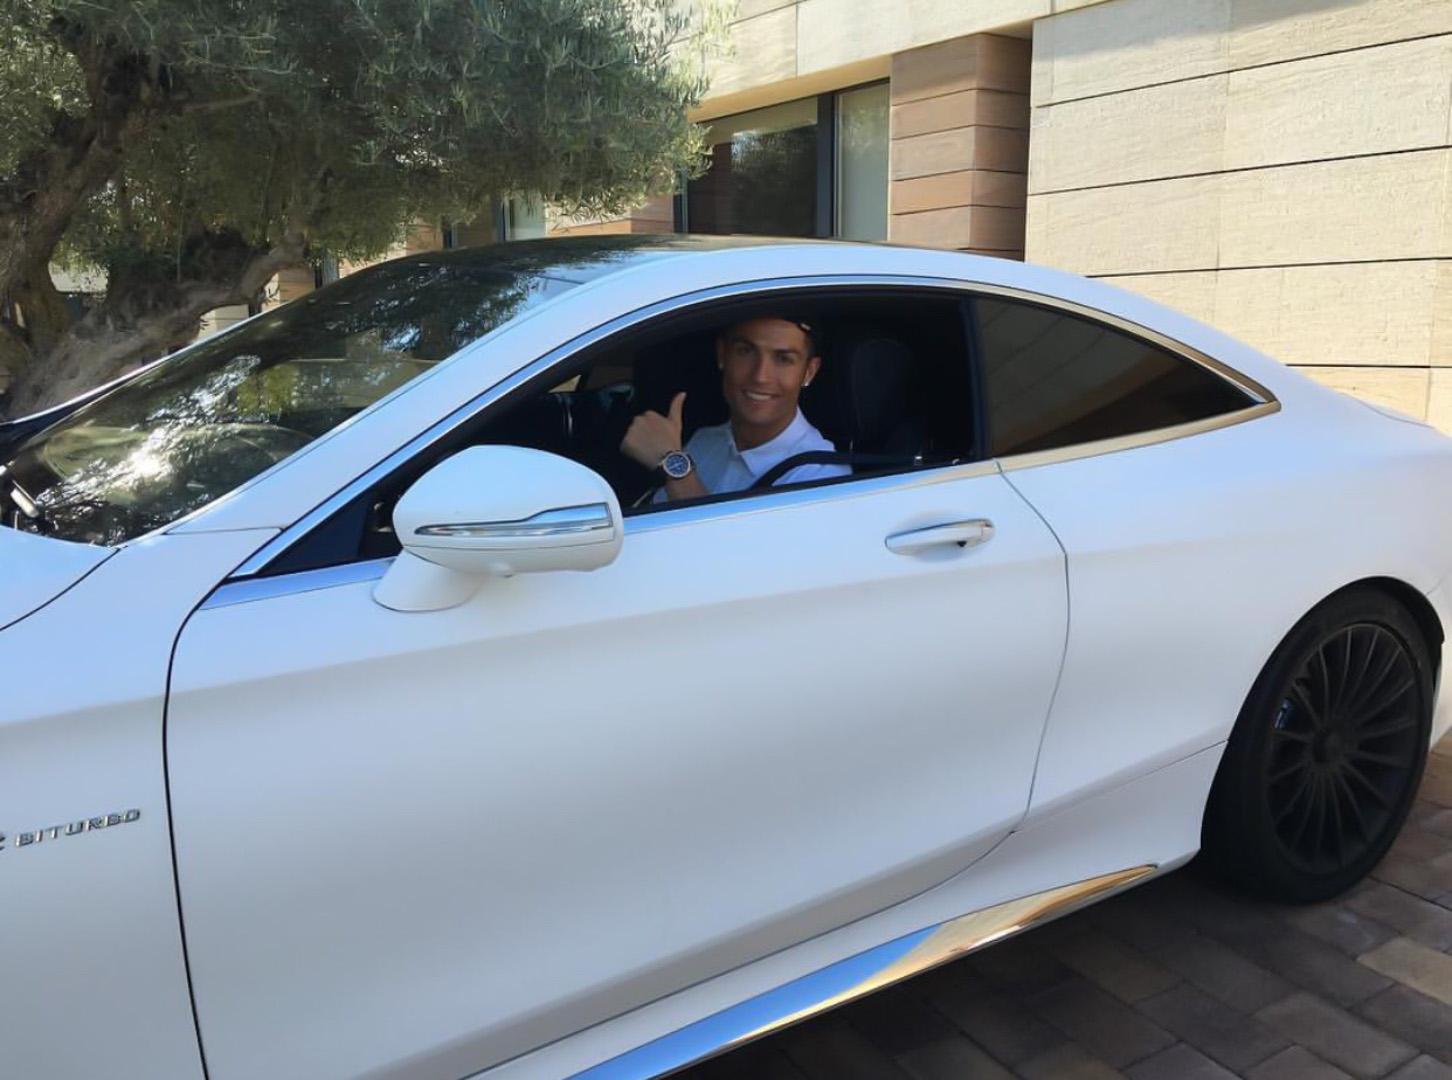 CP-Bộ sưu tập xe của Cristiano Ronaldo (14).jpg